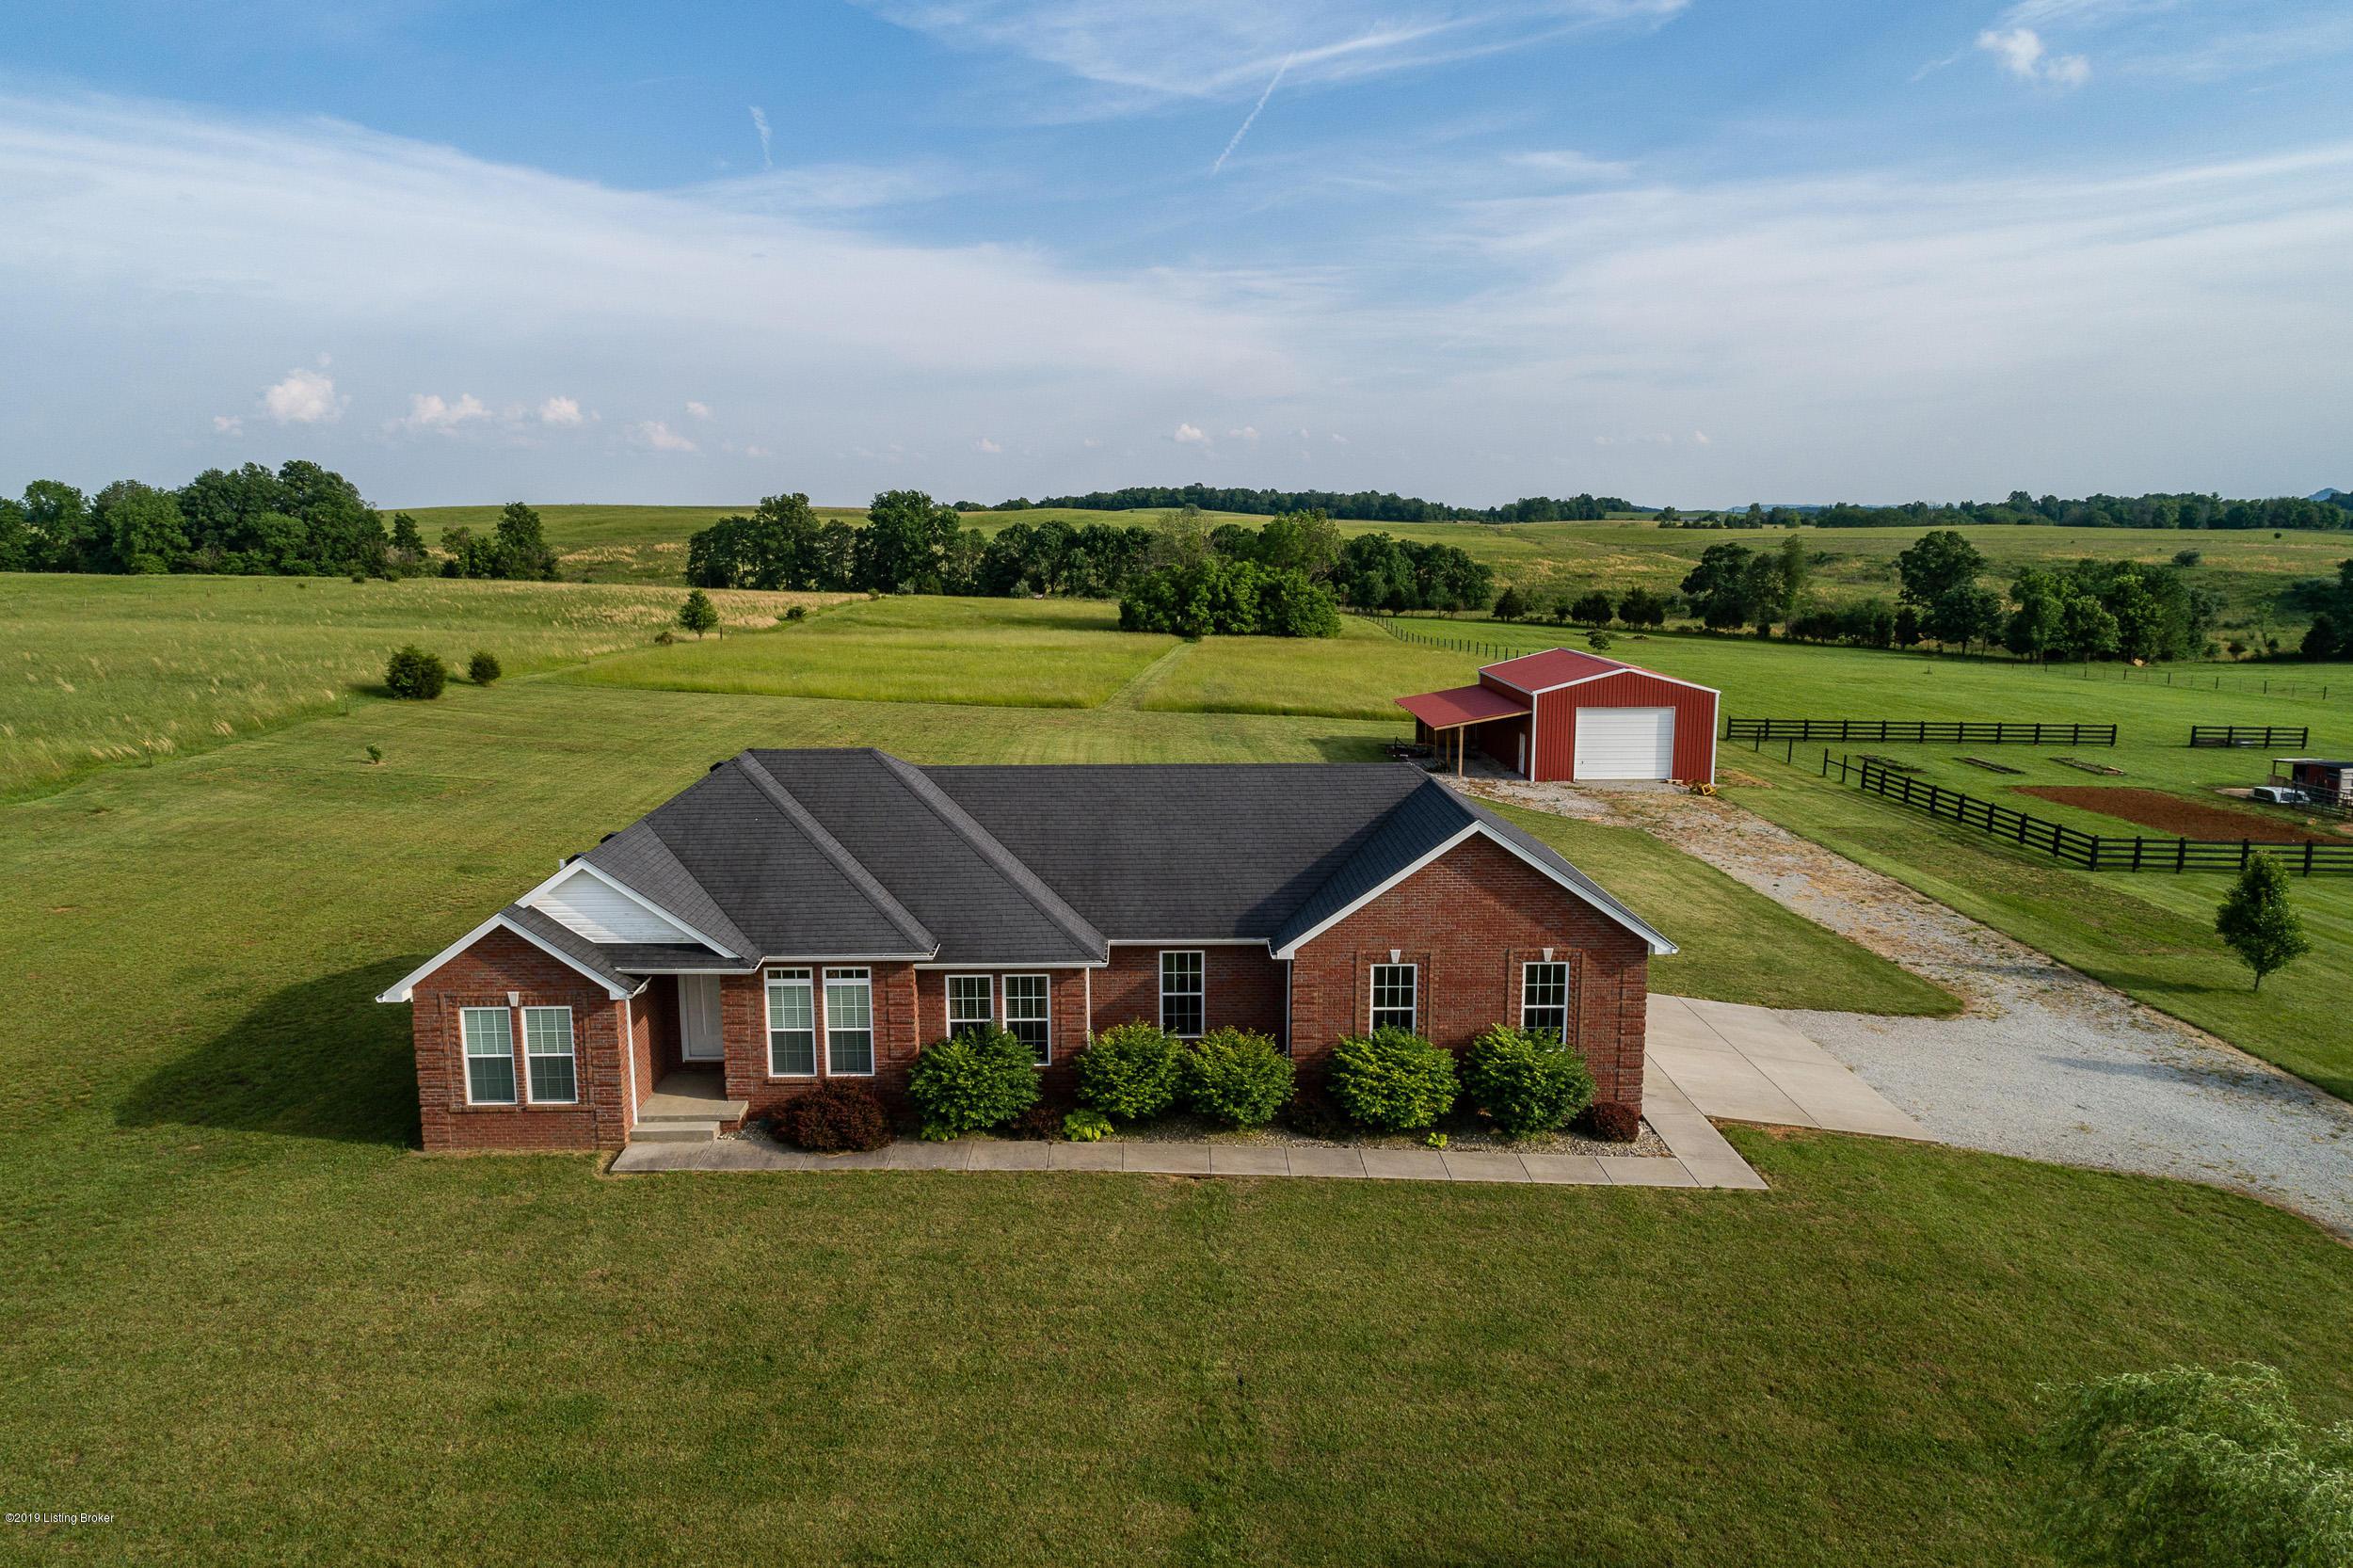 615 Bear Creek Way, Bardstown, Kentucky 40004, 3 Bedrooms Bedrooms, 6 Rooms Rooms,2 BathroomsBathrooms,Residential,For Sale,Bear Creek,1515057